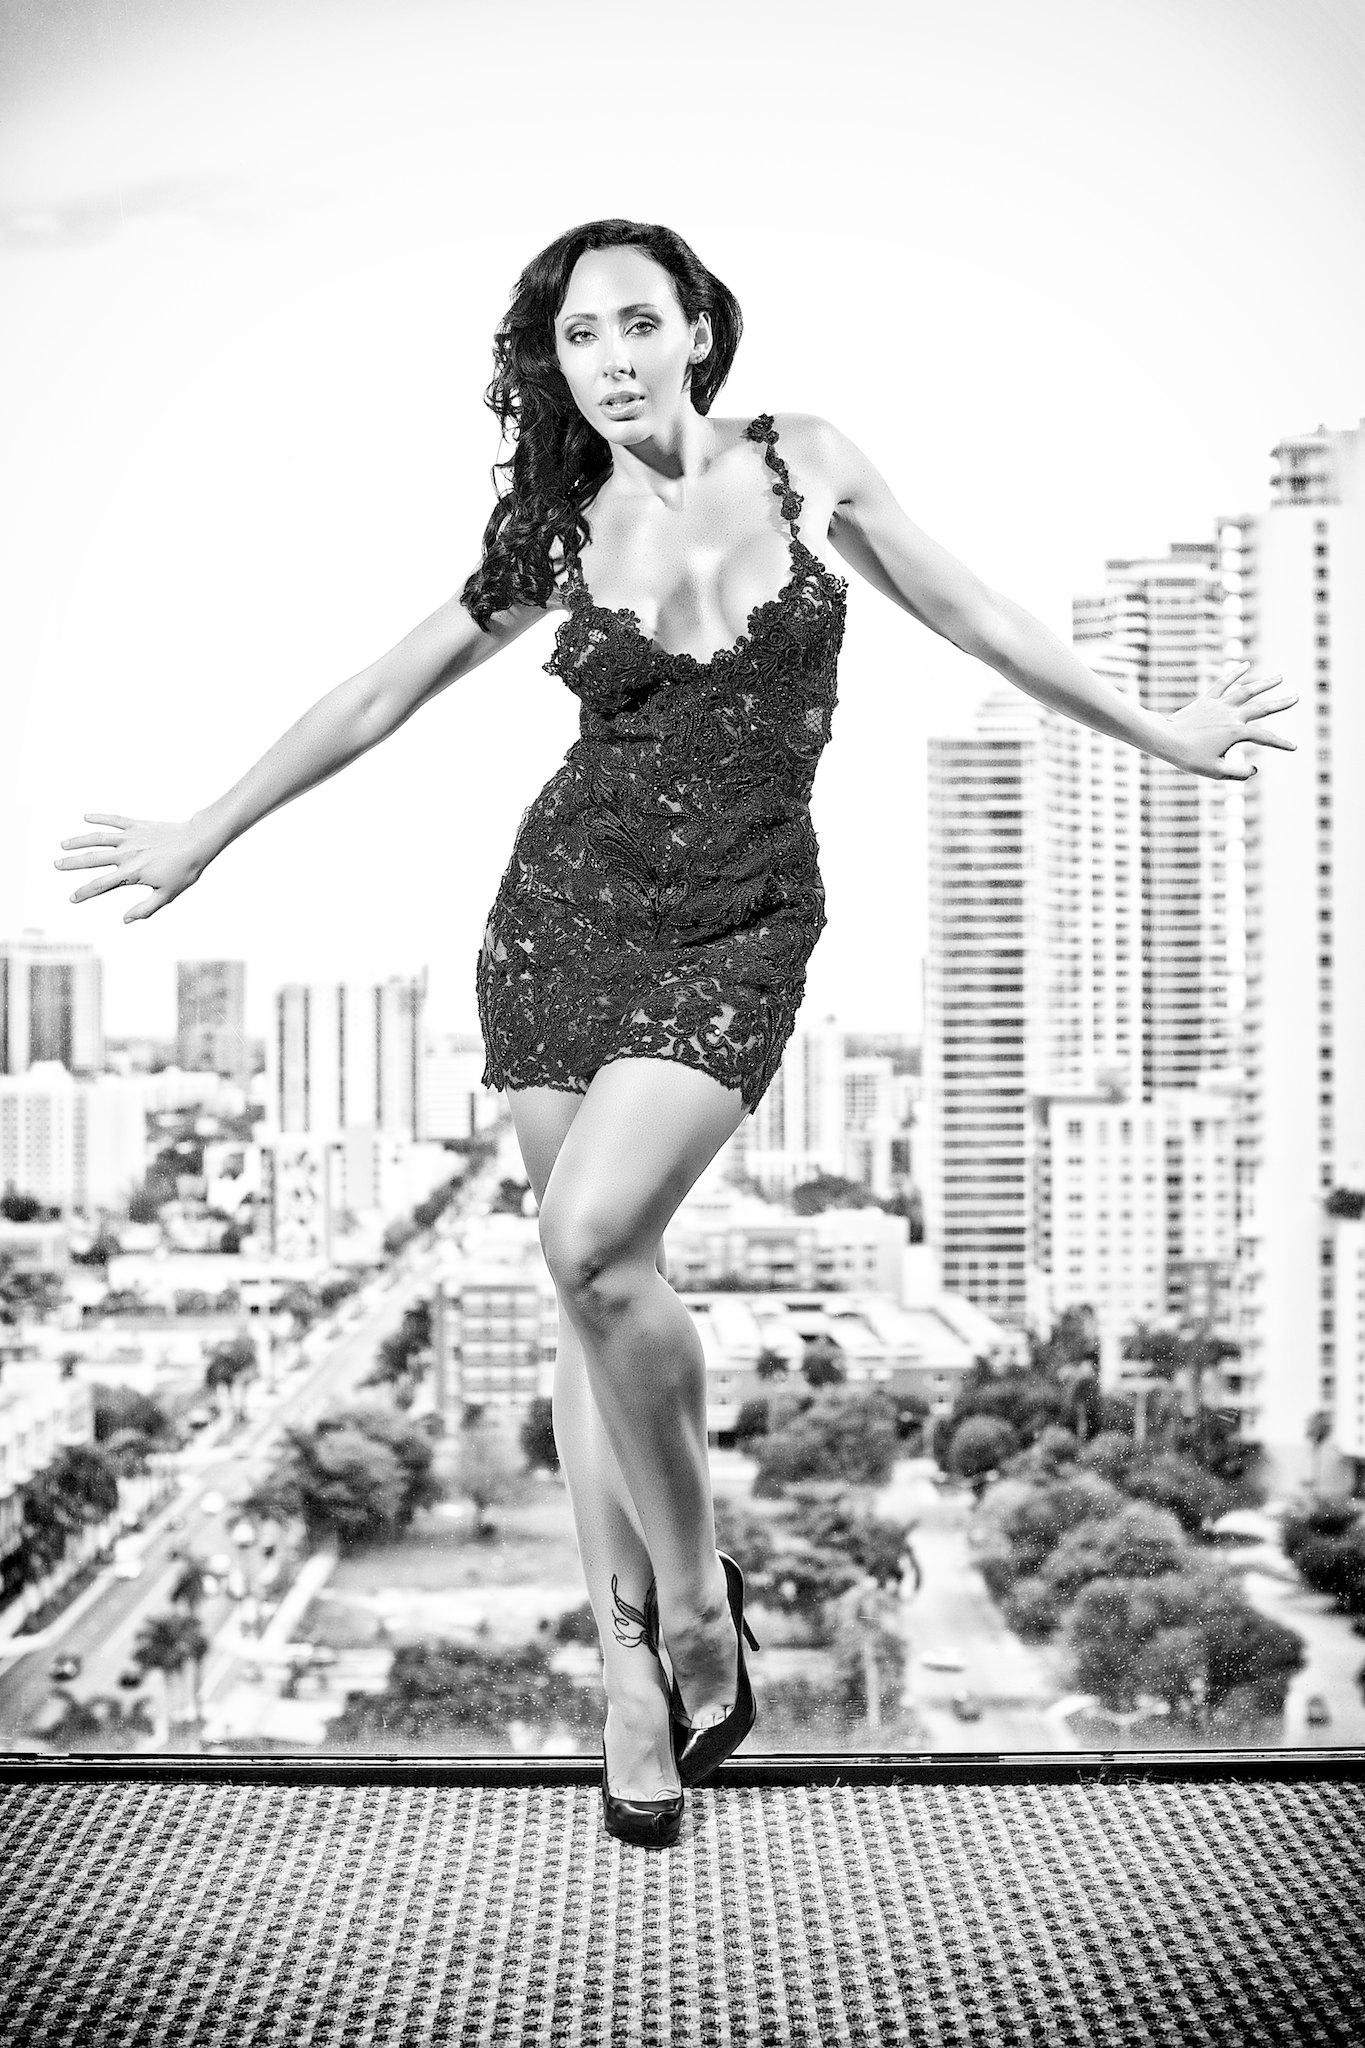 Photo shoot with Mia Corday, fashion styling by Eva Danielle, for Fashion Erotica Magazine